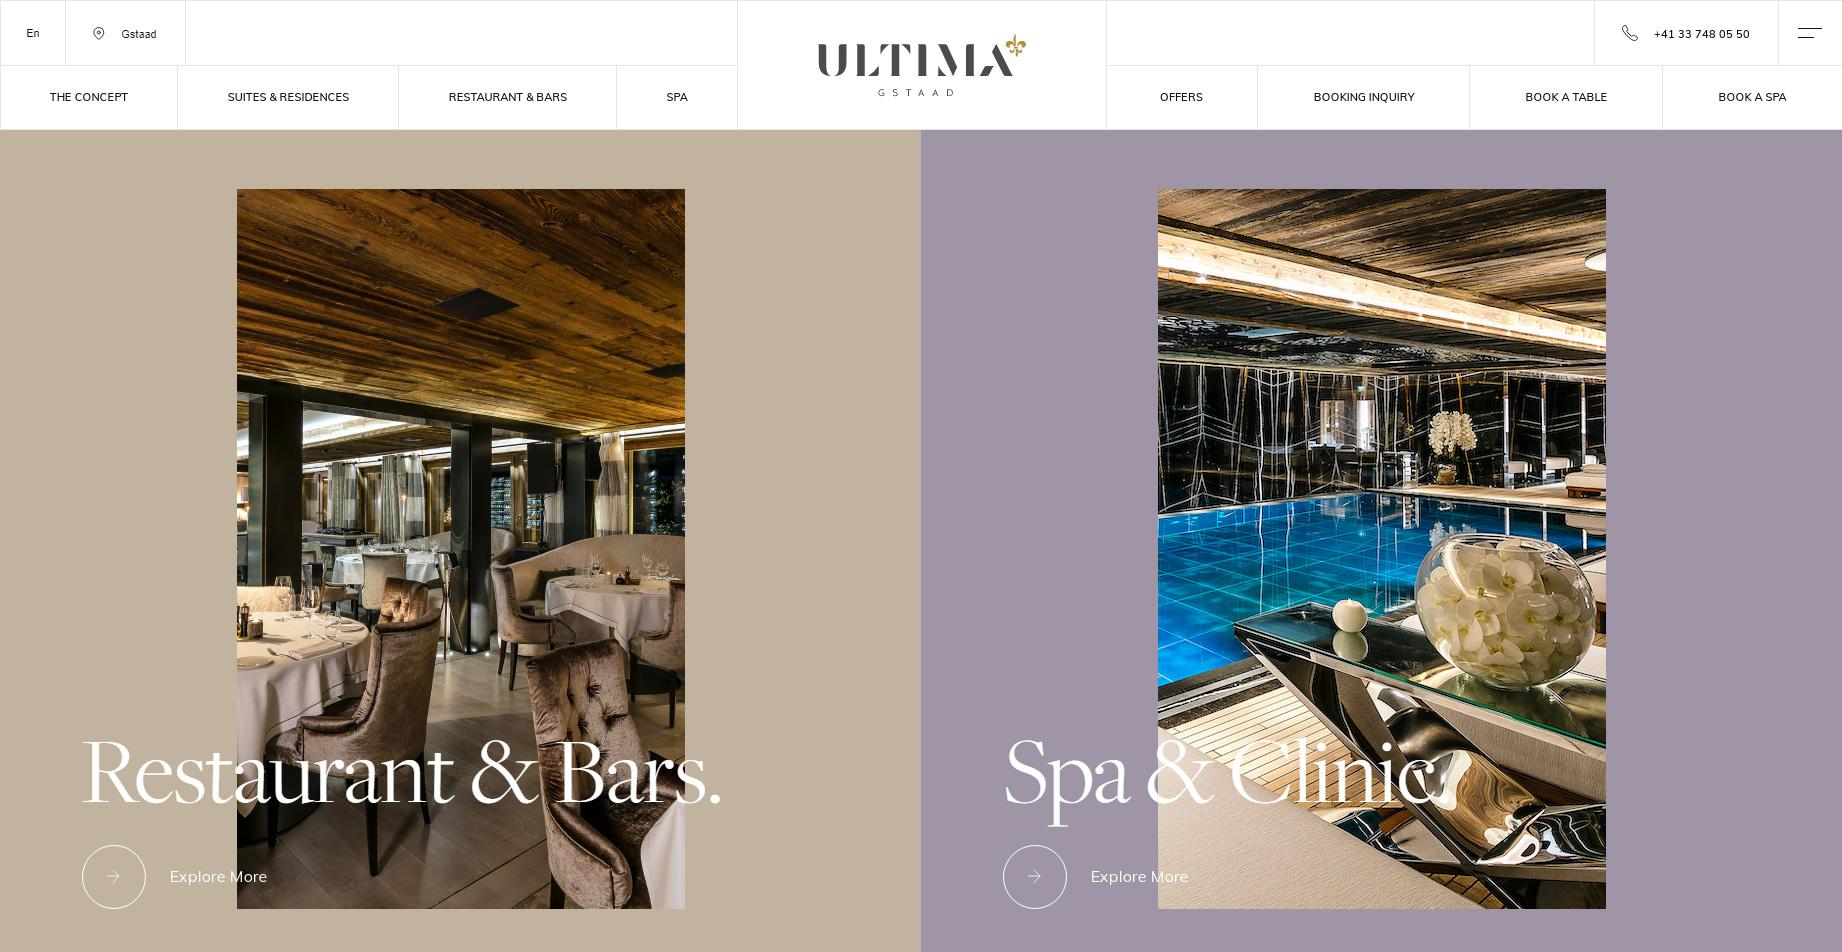 ULTIMA GSTAAD SWITZERLAND - Website of the Day